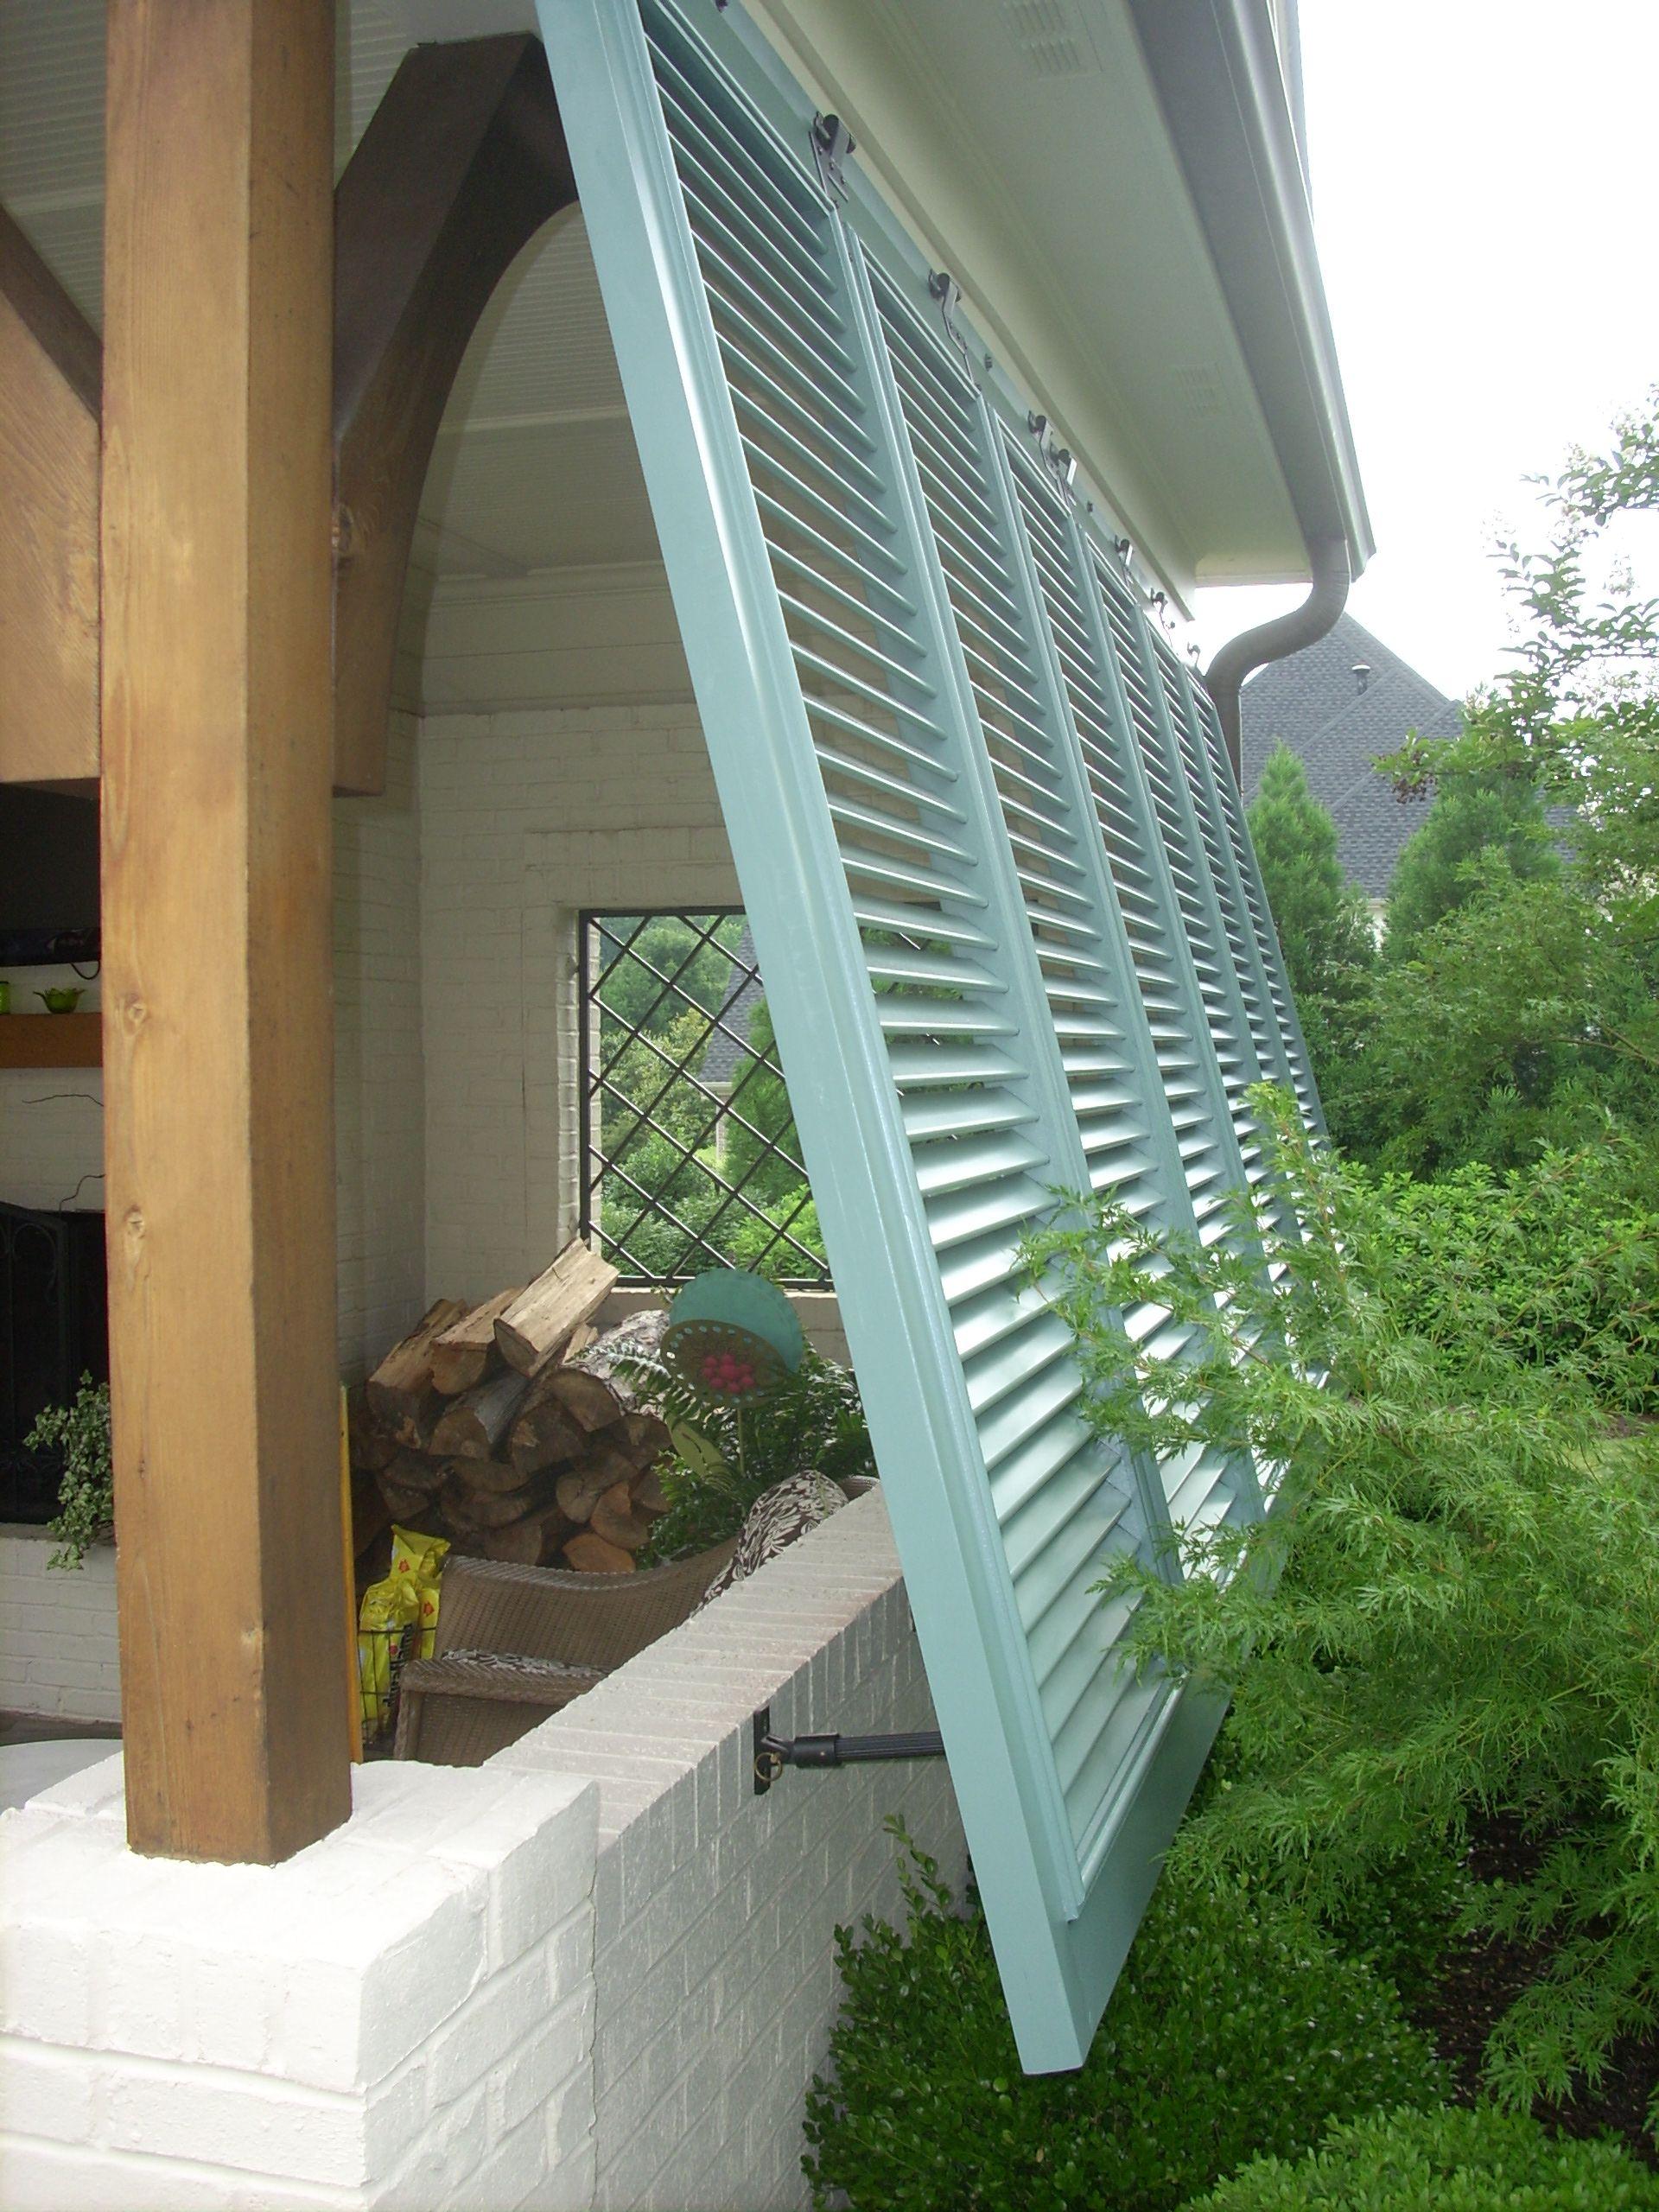 Bermuda shutters on a porch lin inn orangery for Porch window ideas